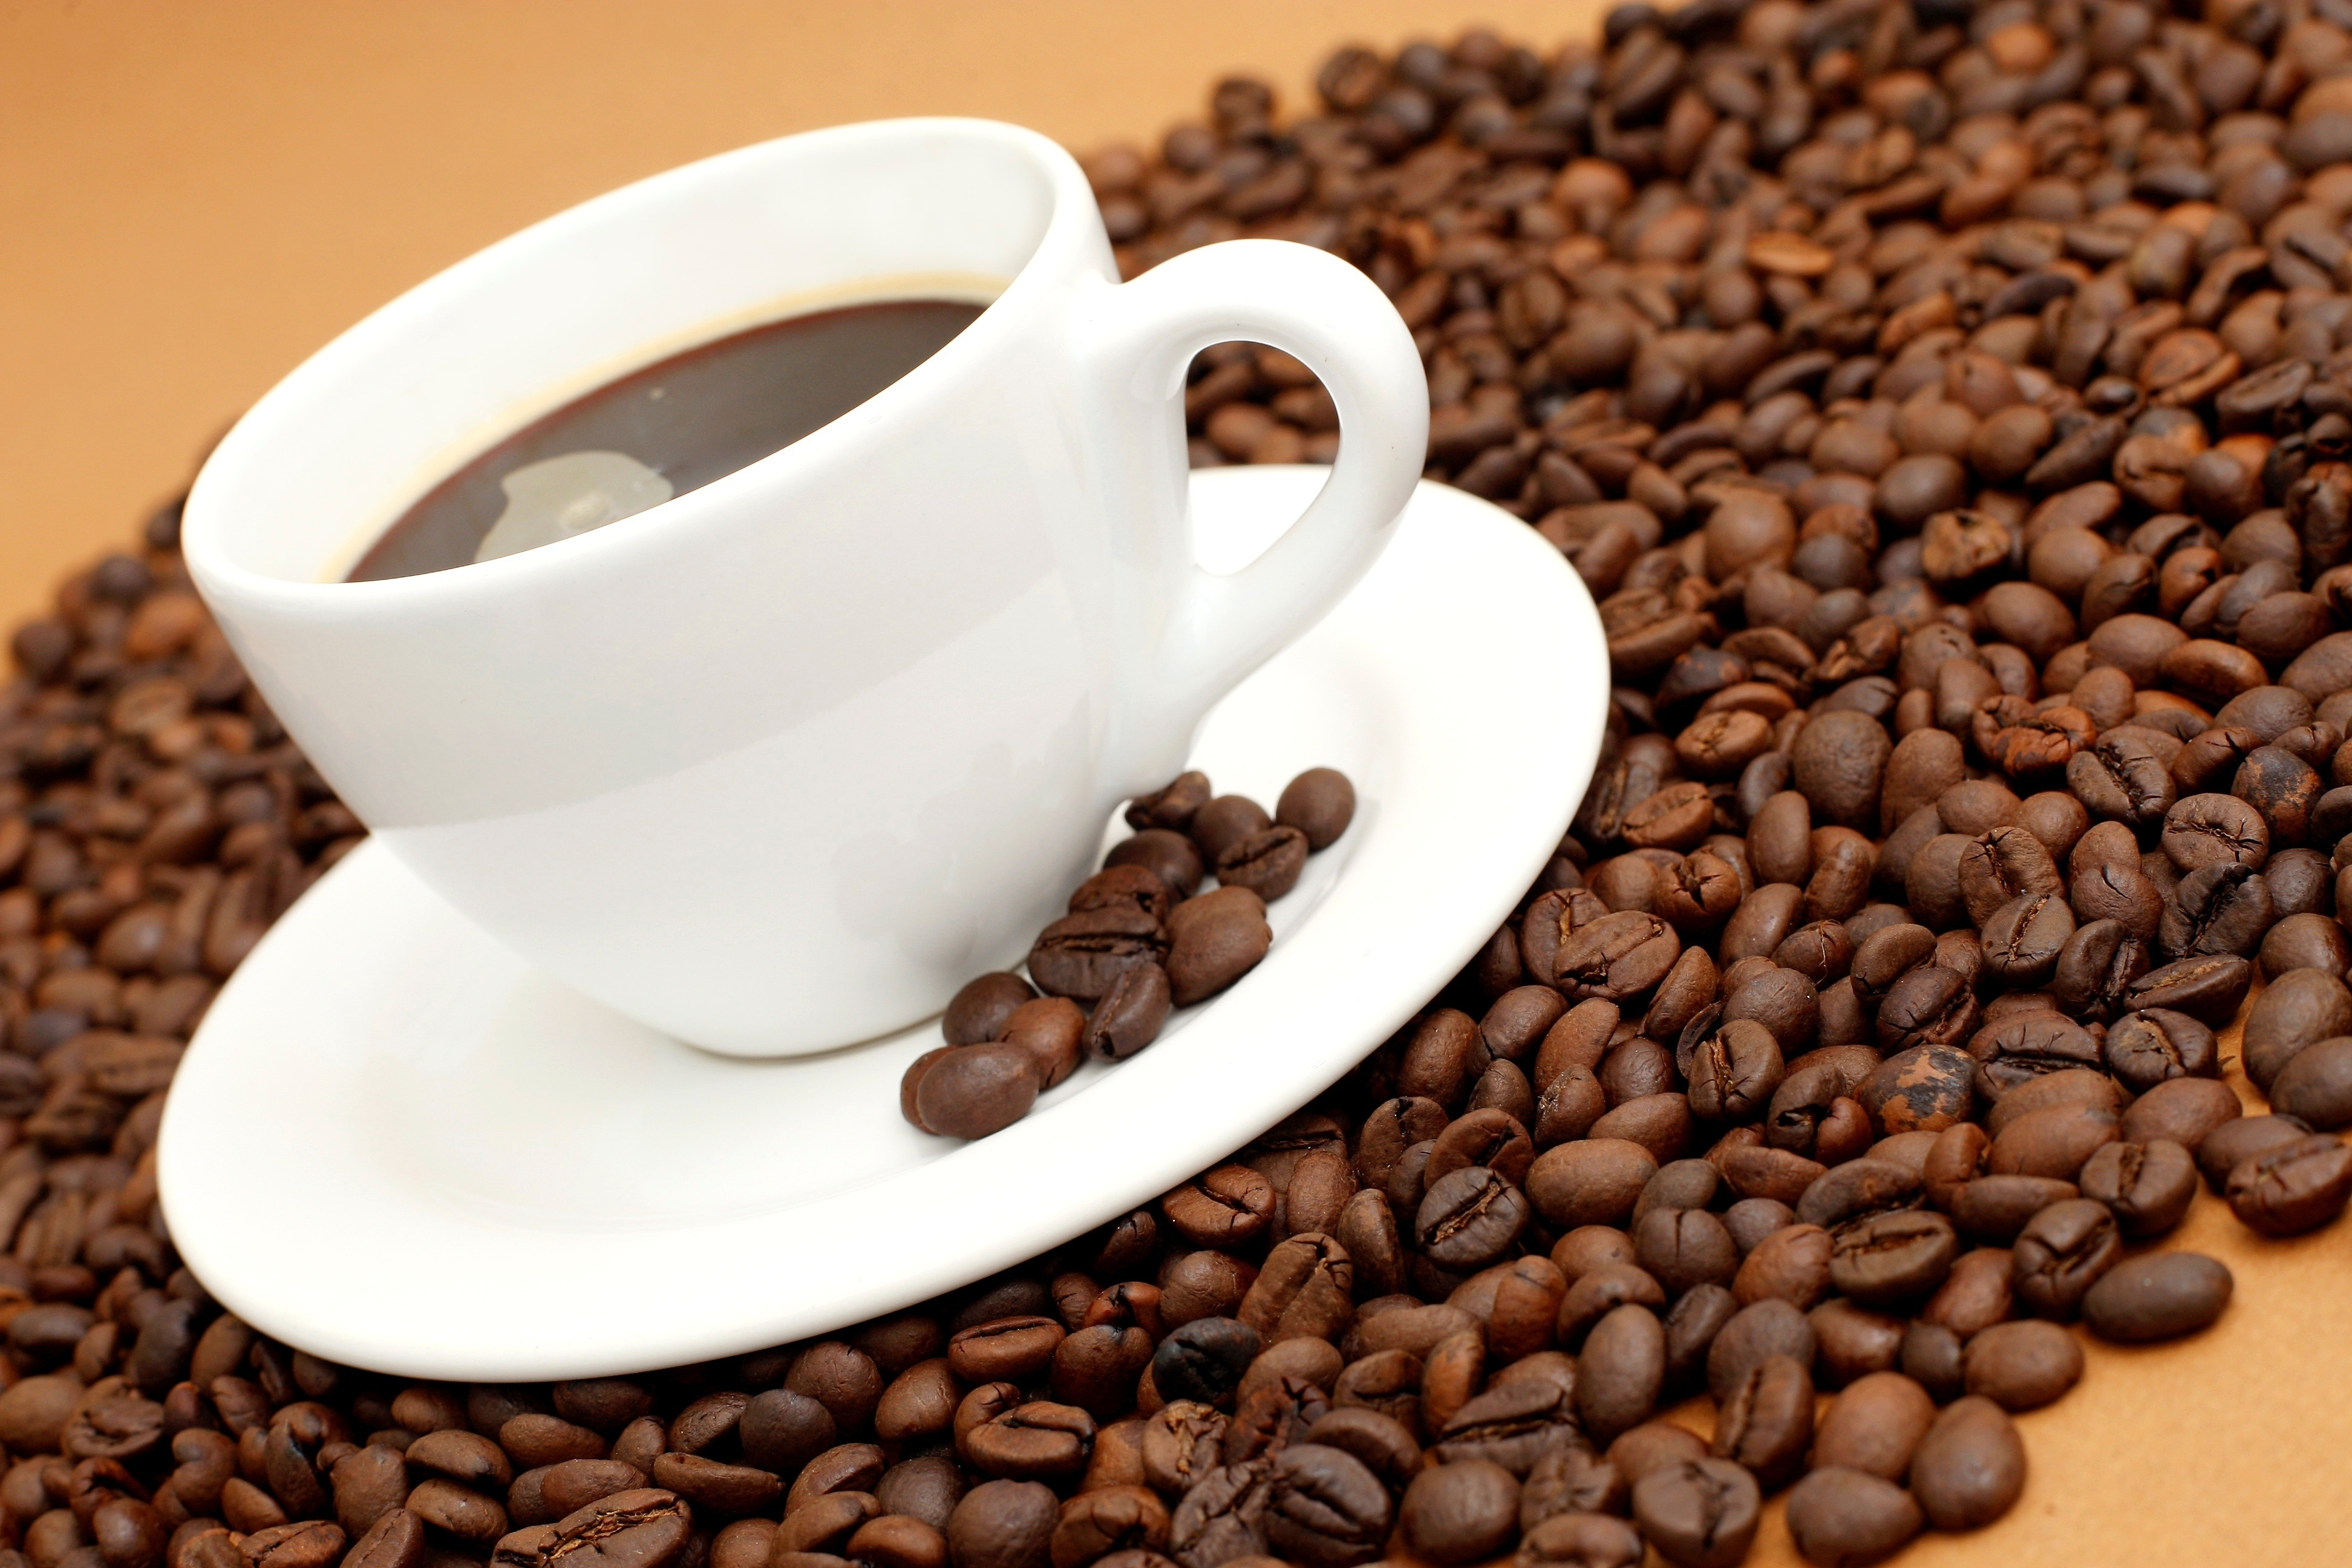 Coffee 4k Ultra HD Wallpaper | Background Image | 3888x2592 | ID:386718 - Wallpaper Abyss